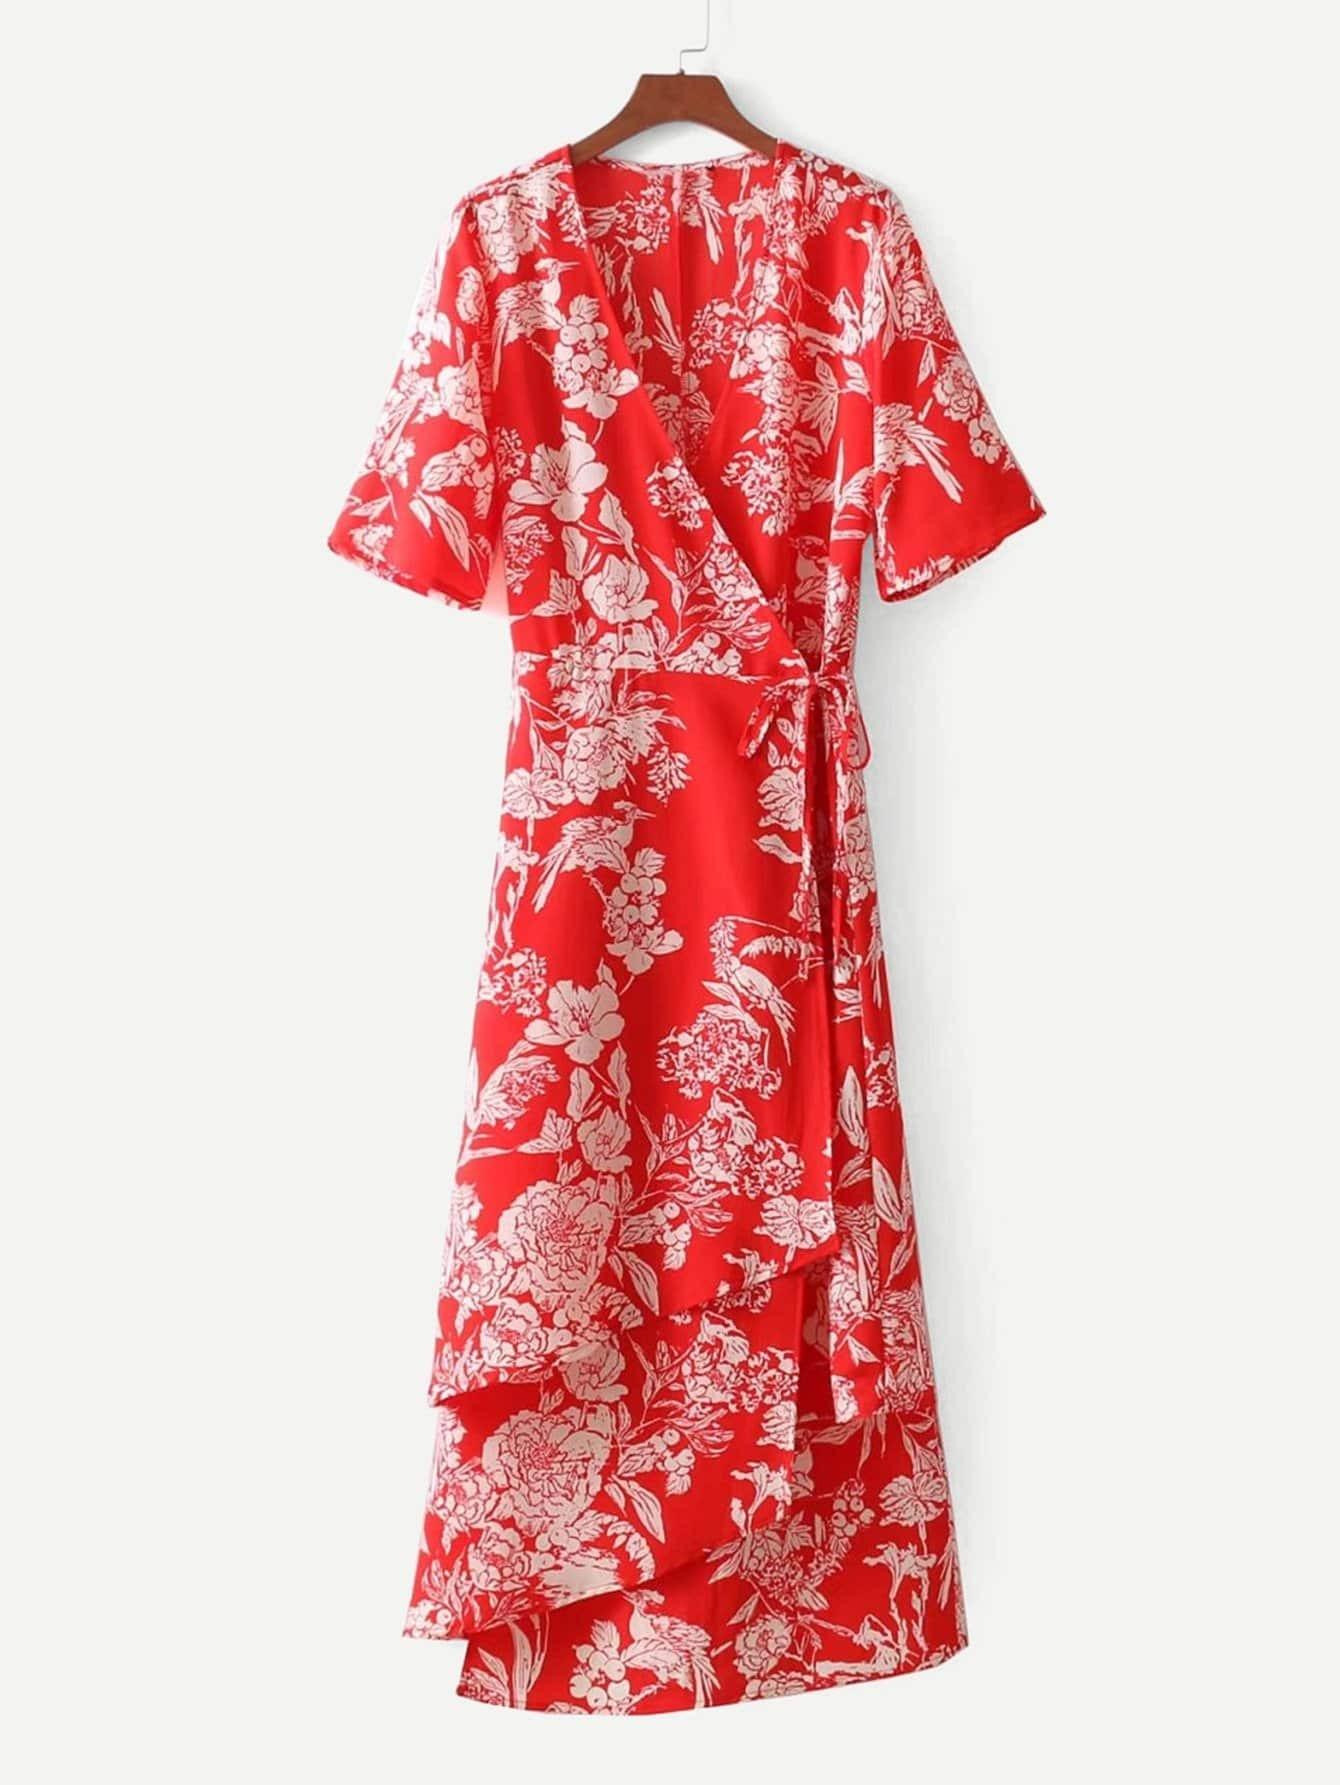 Botanical Print Wrap Dress botanical print surplice wrap dress